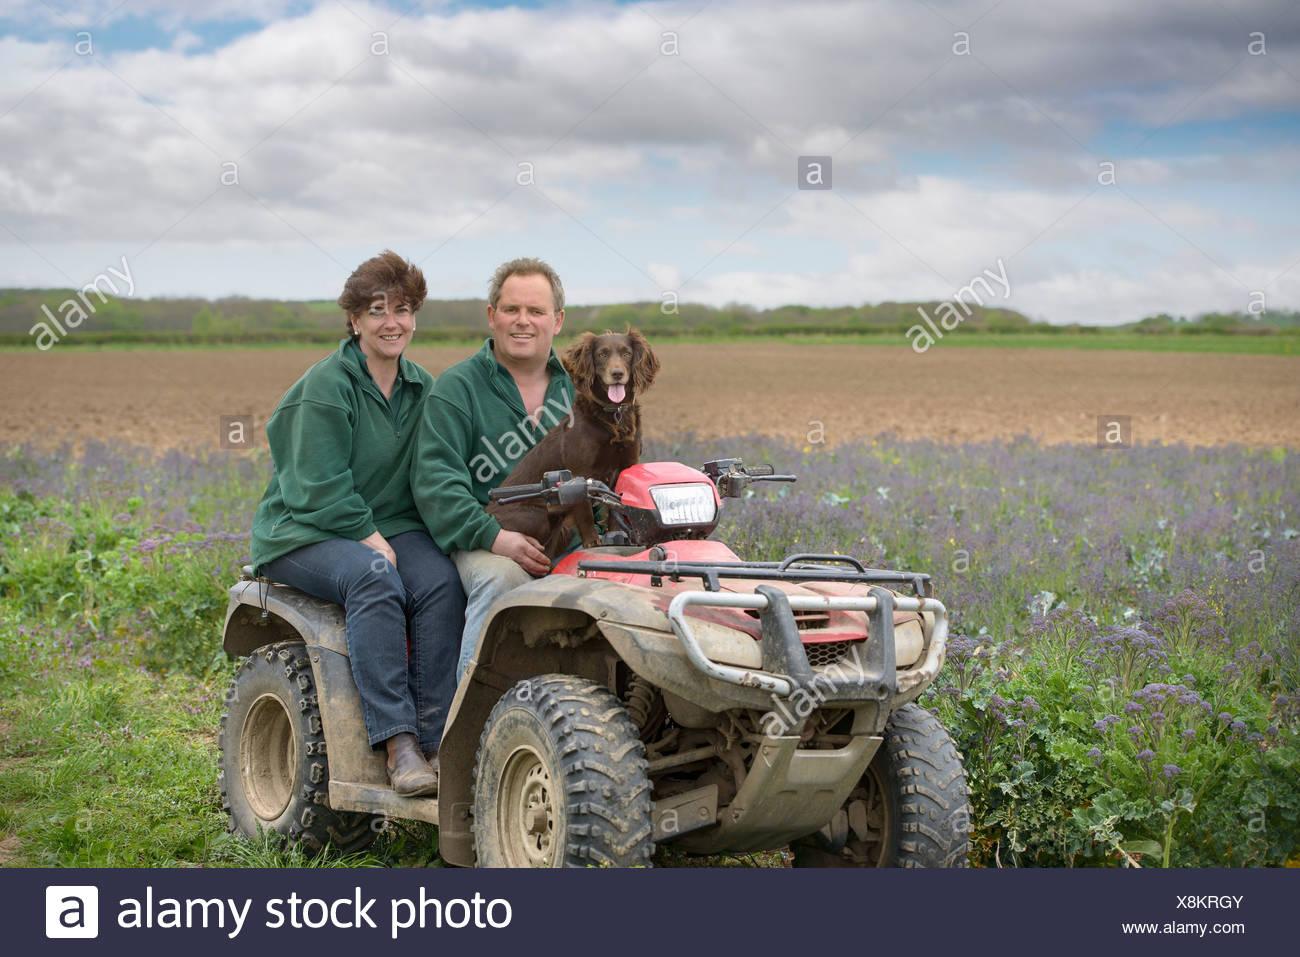 Farmer, wife and pet dog on quad bike in field of organic farm - Stock Image